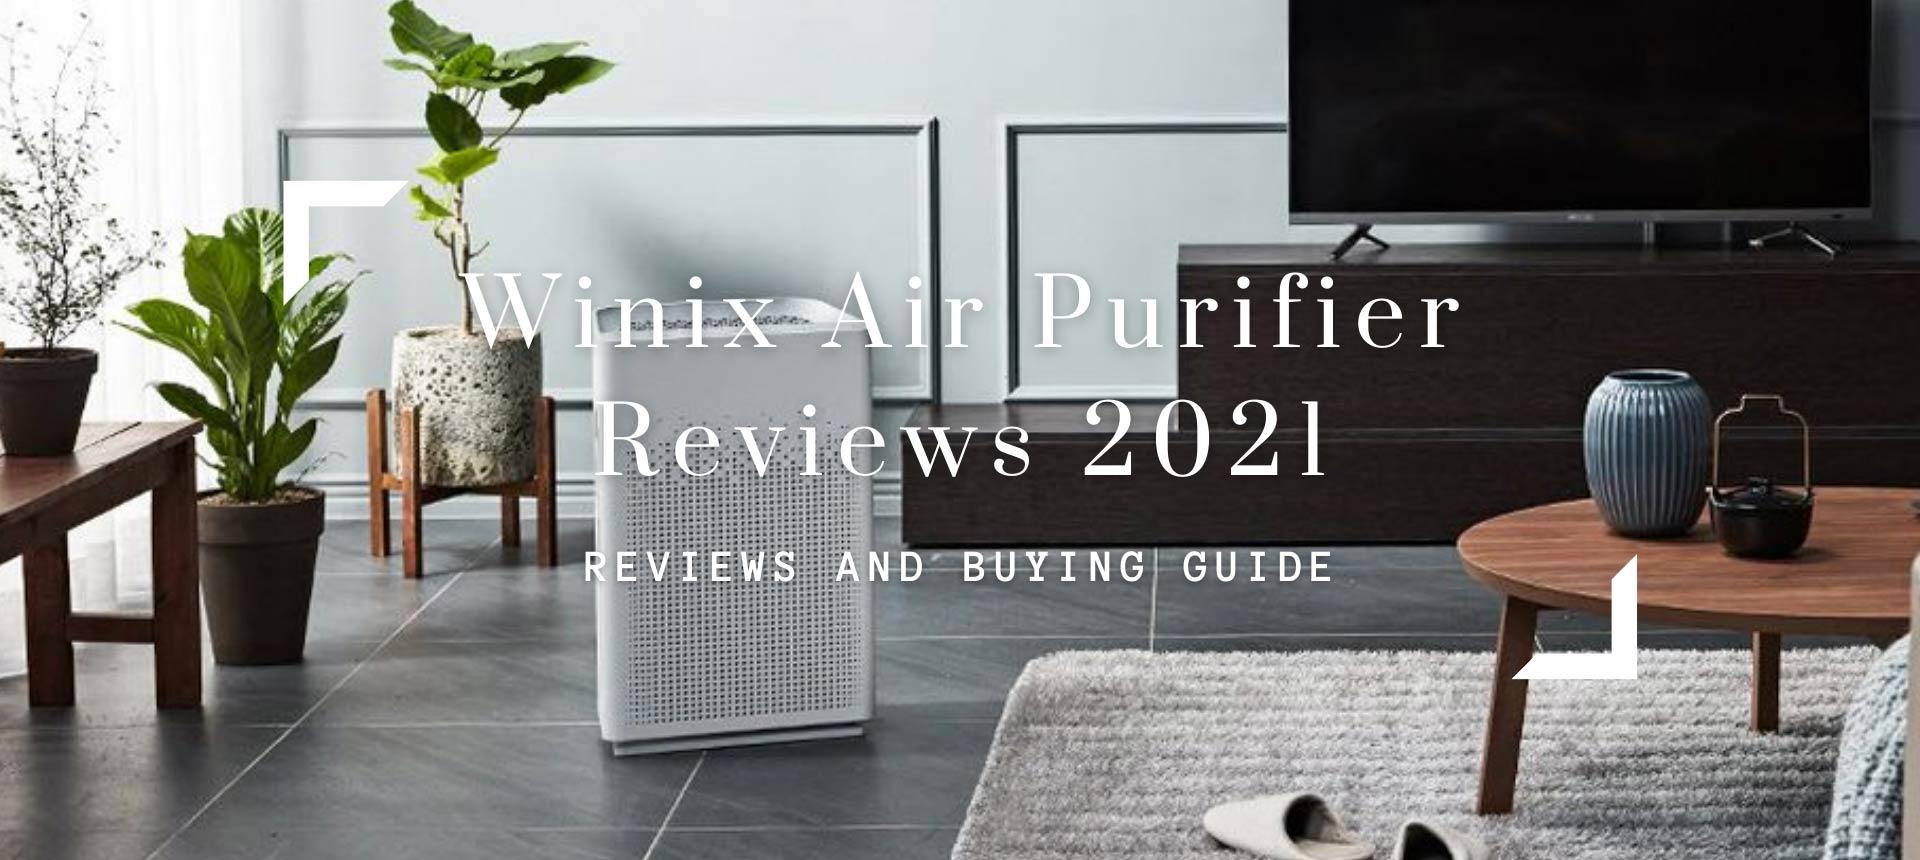 Winix Air Purifier Reviews 2021-Best Model, Pros & Cons